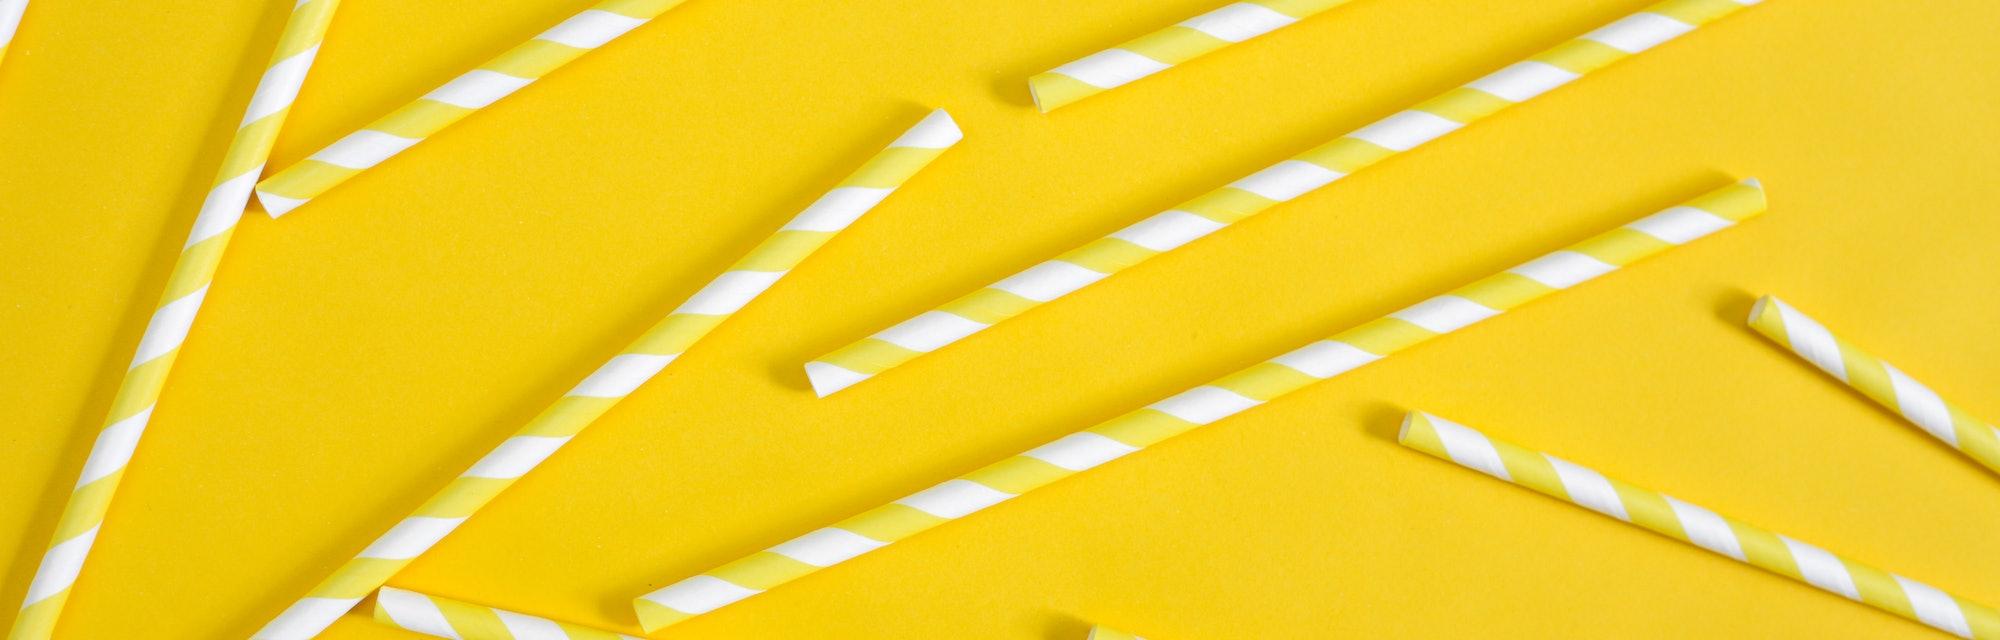 Single use plastic straws on yellow background